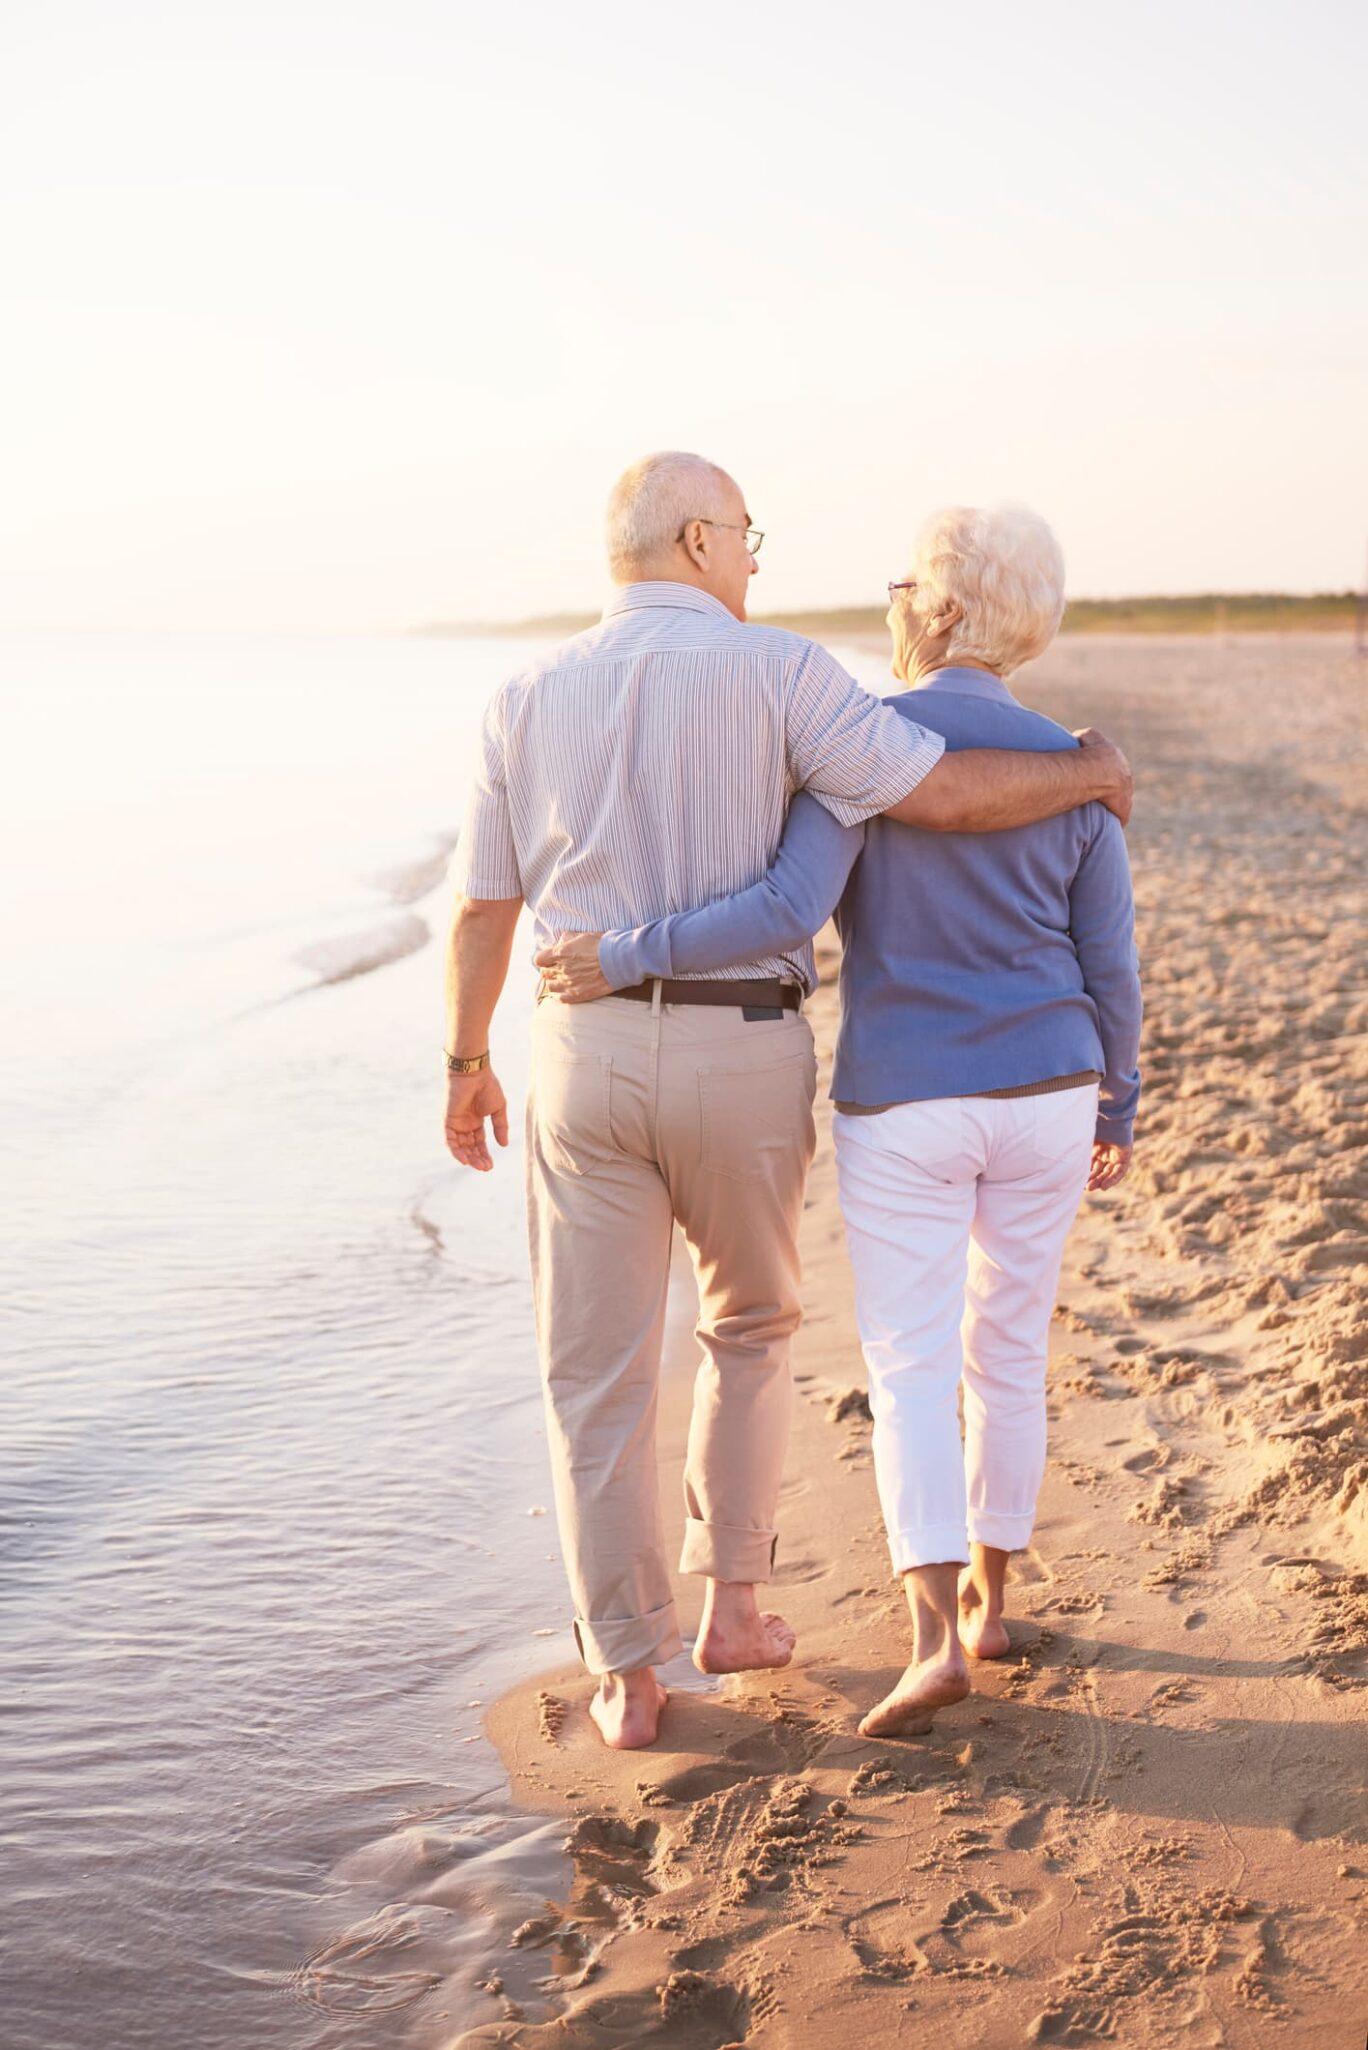 Older couple walking side by side along the beach.